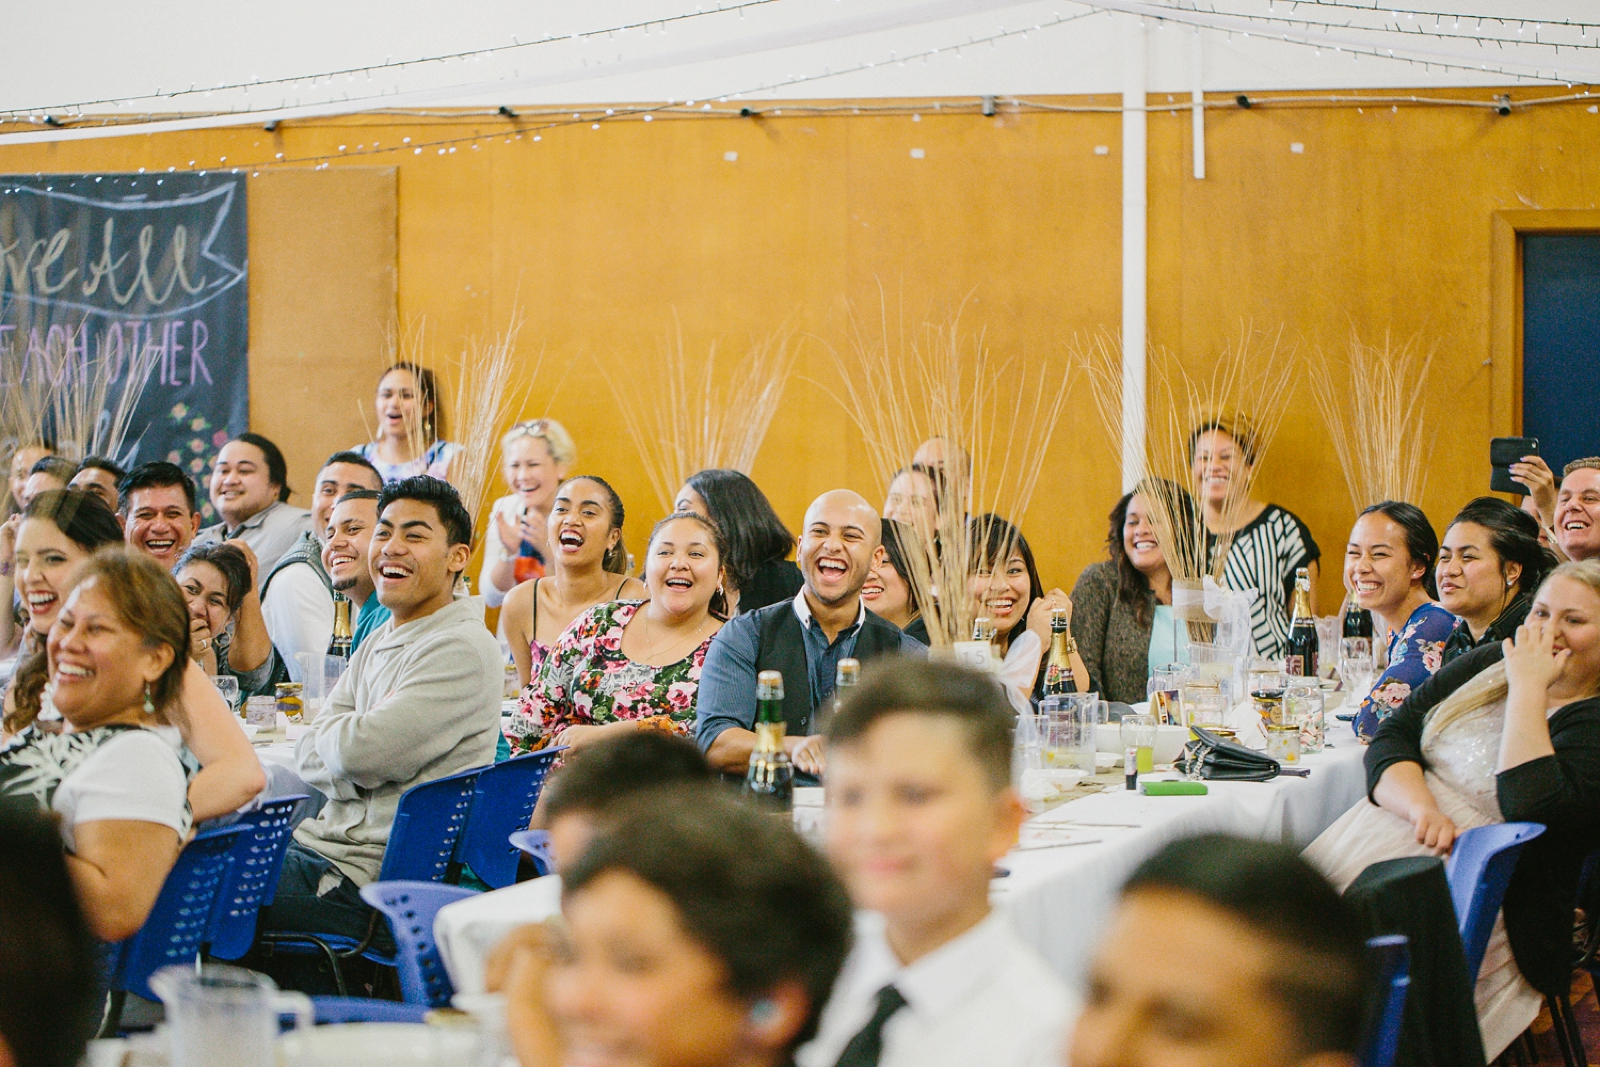 GabbyFiti_Auckland Wedding Photographer_Patty Lagera_0092.jpg